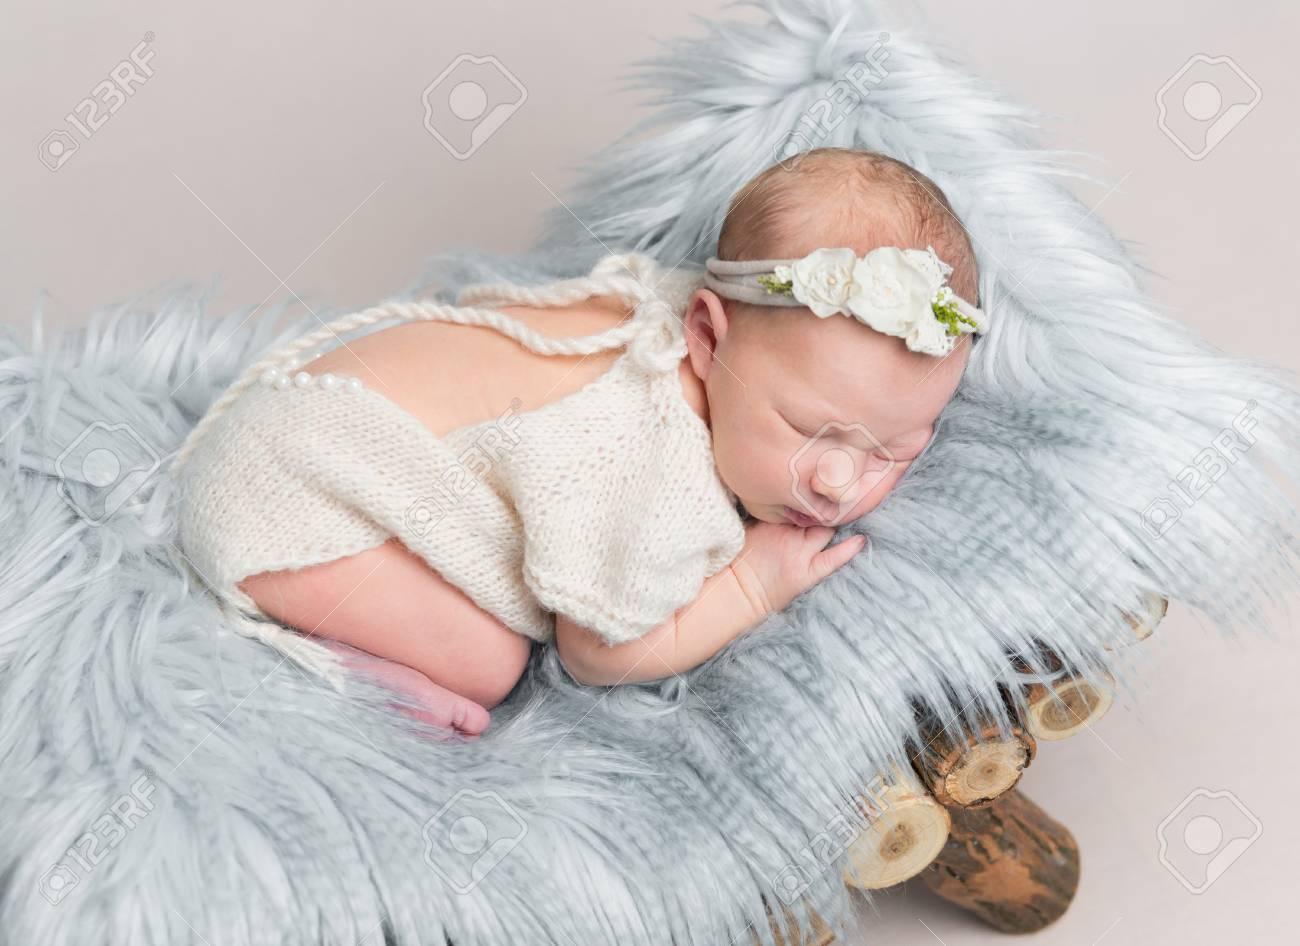 Newborn baby girl sleeps on small wooden crib. - 91187388